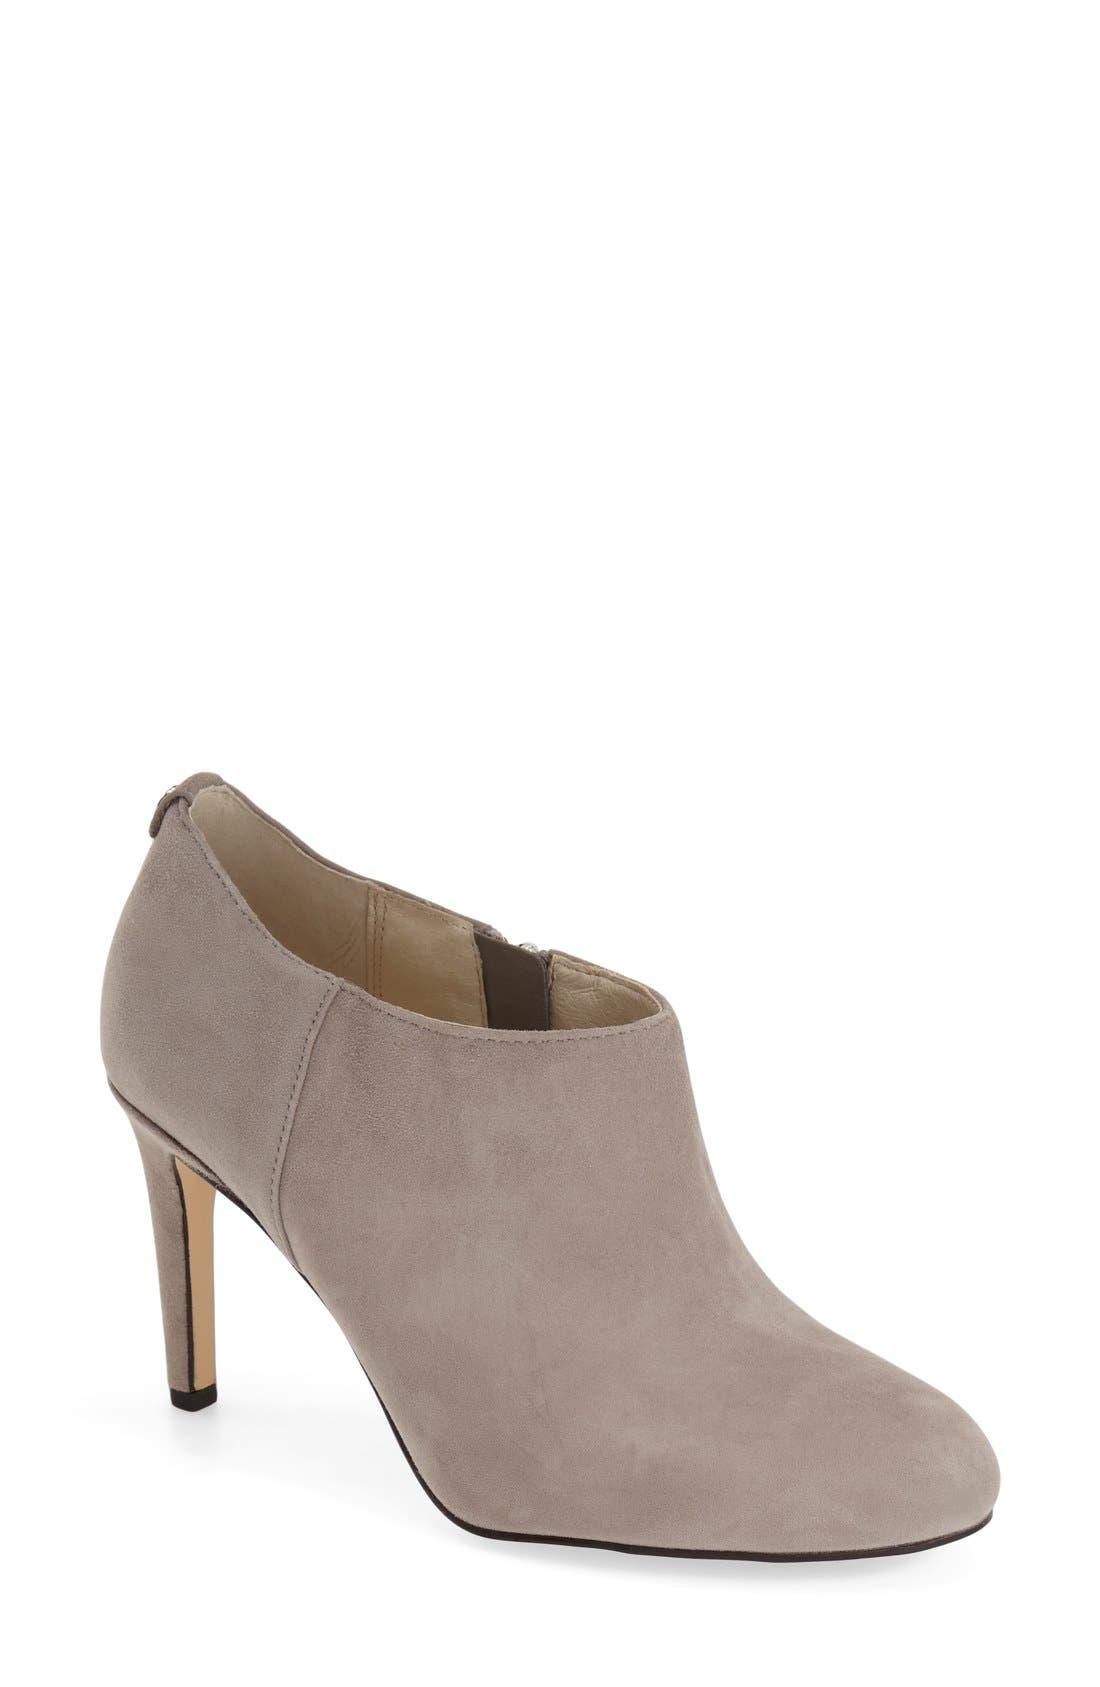 Main Image - MICHAEL Michael Kors 'Sammy' Ankle Boot (Women)